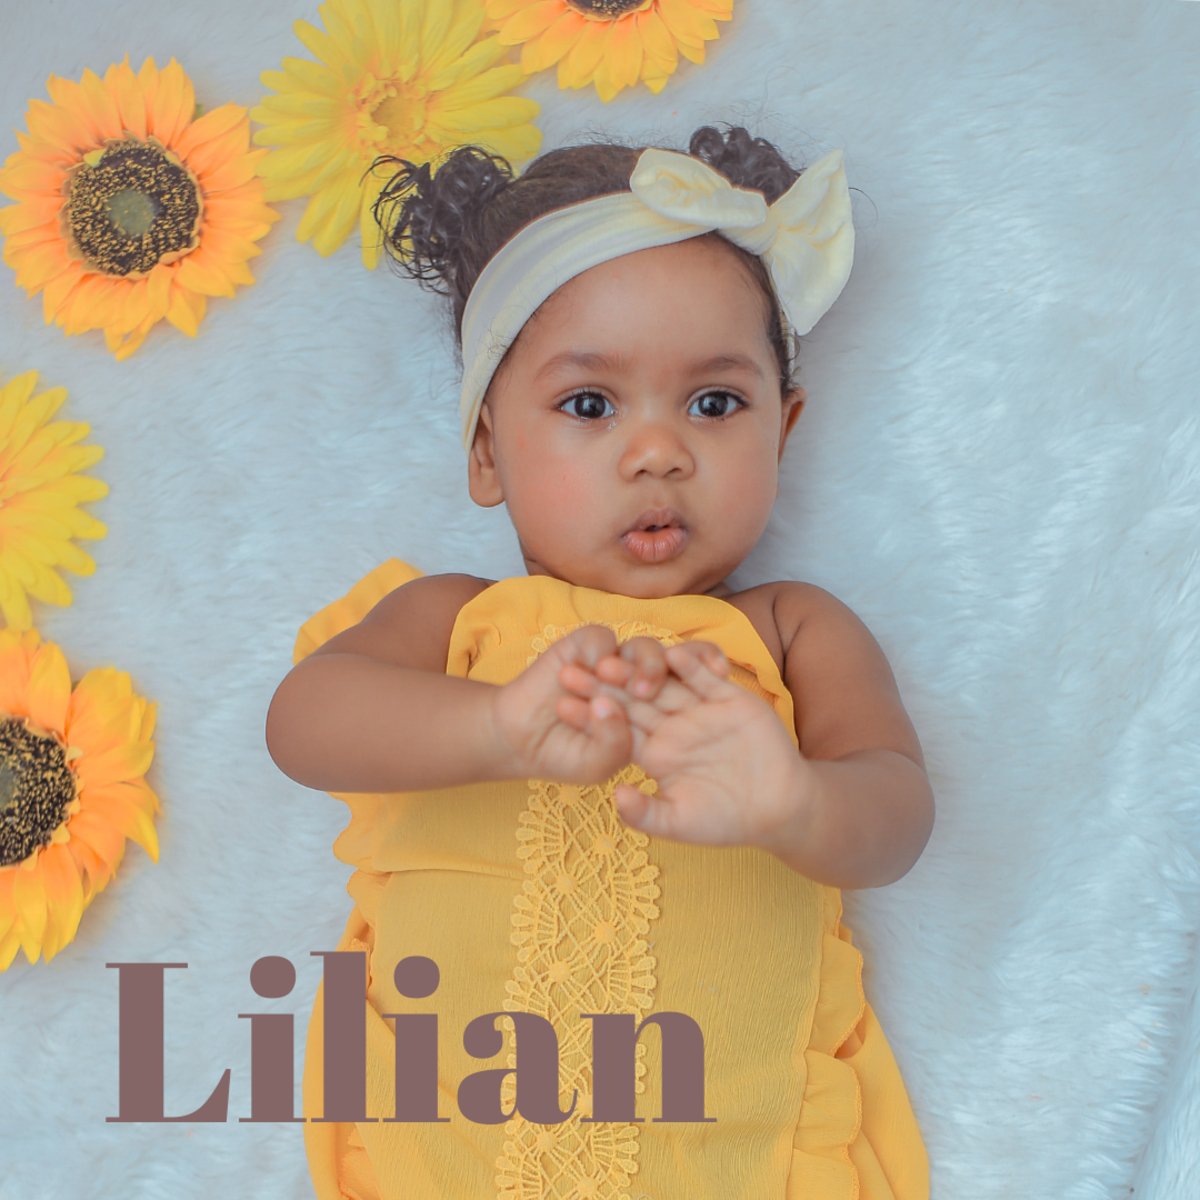 Baby Lilian